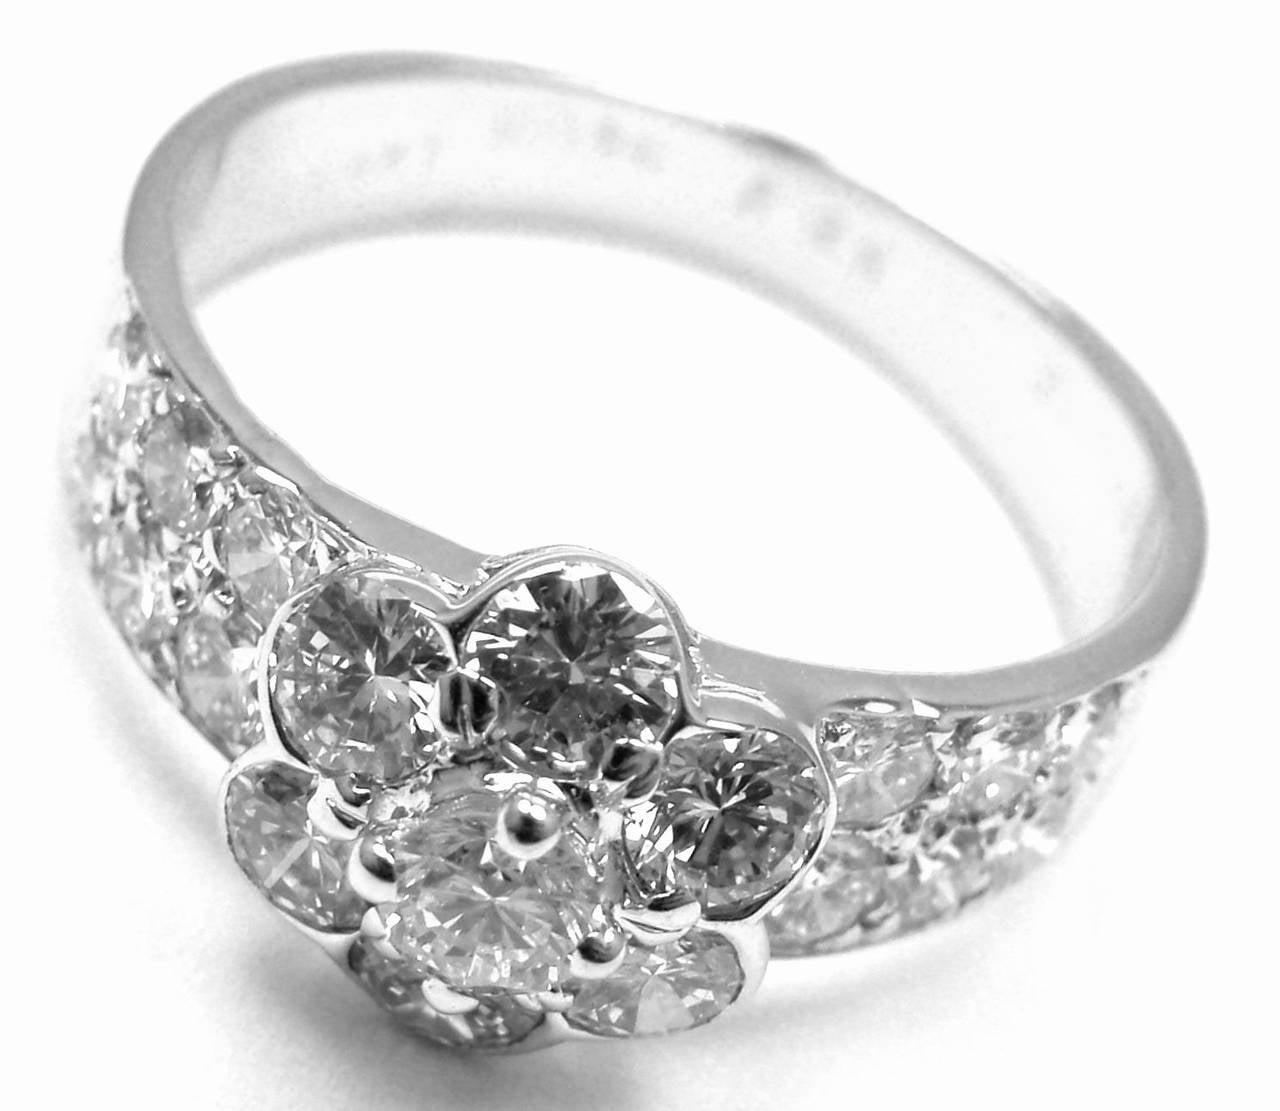 Van Cleef & Arpels Diamond Fleurette Flower Gold Ring For Sale 1